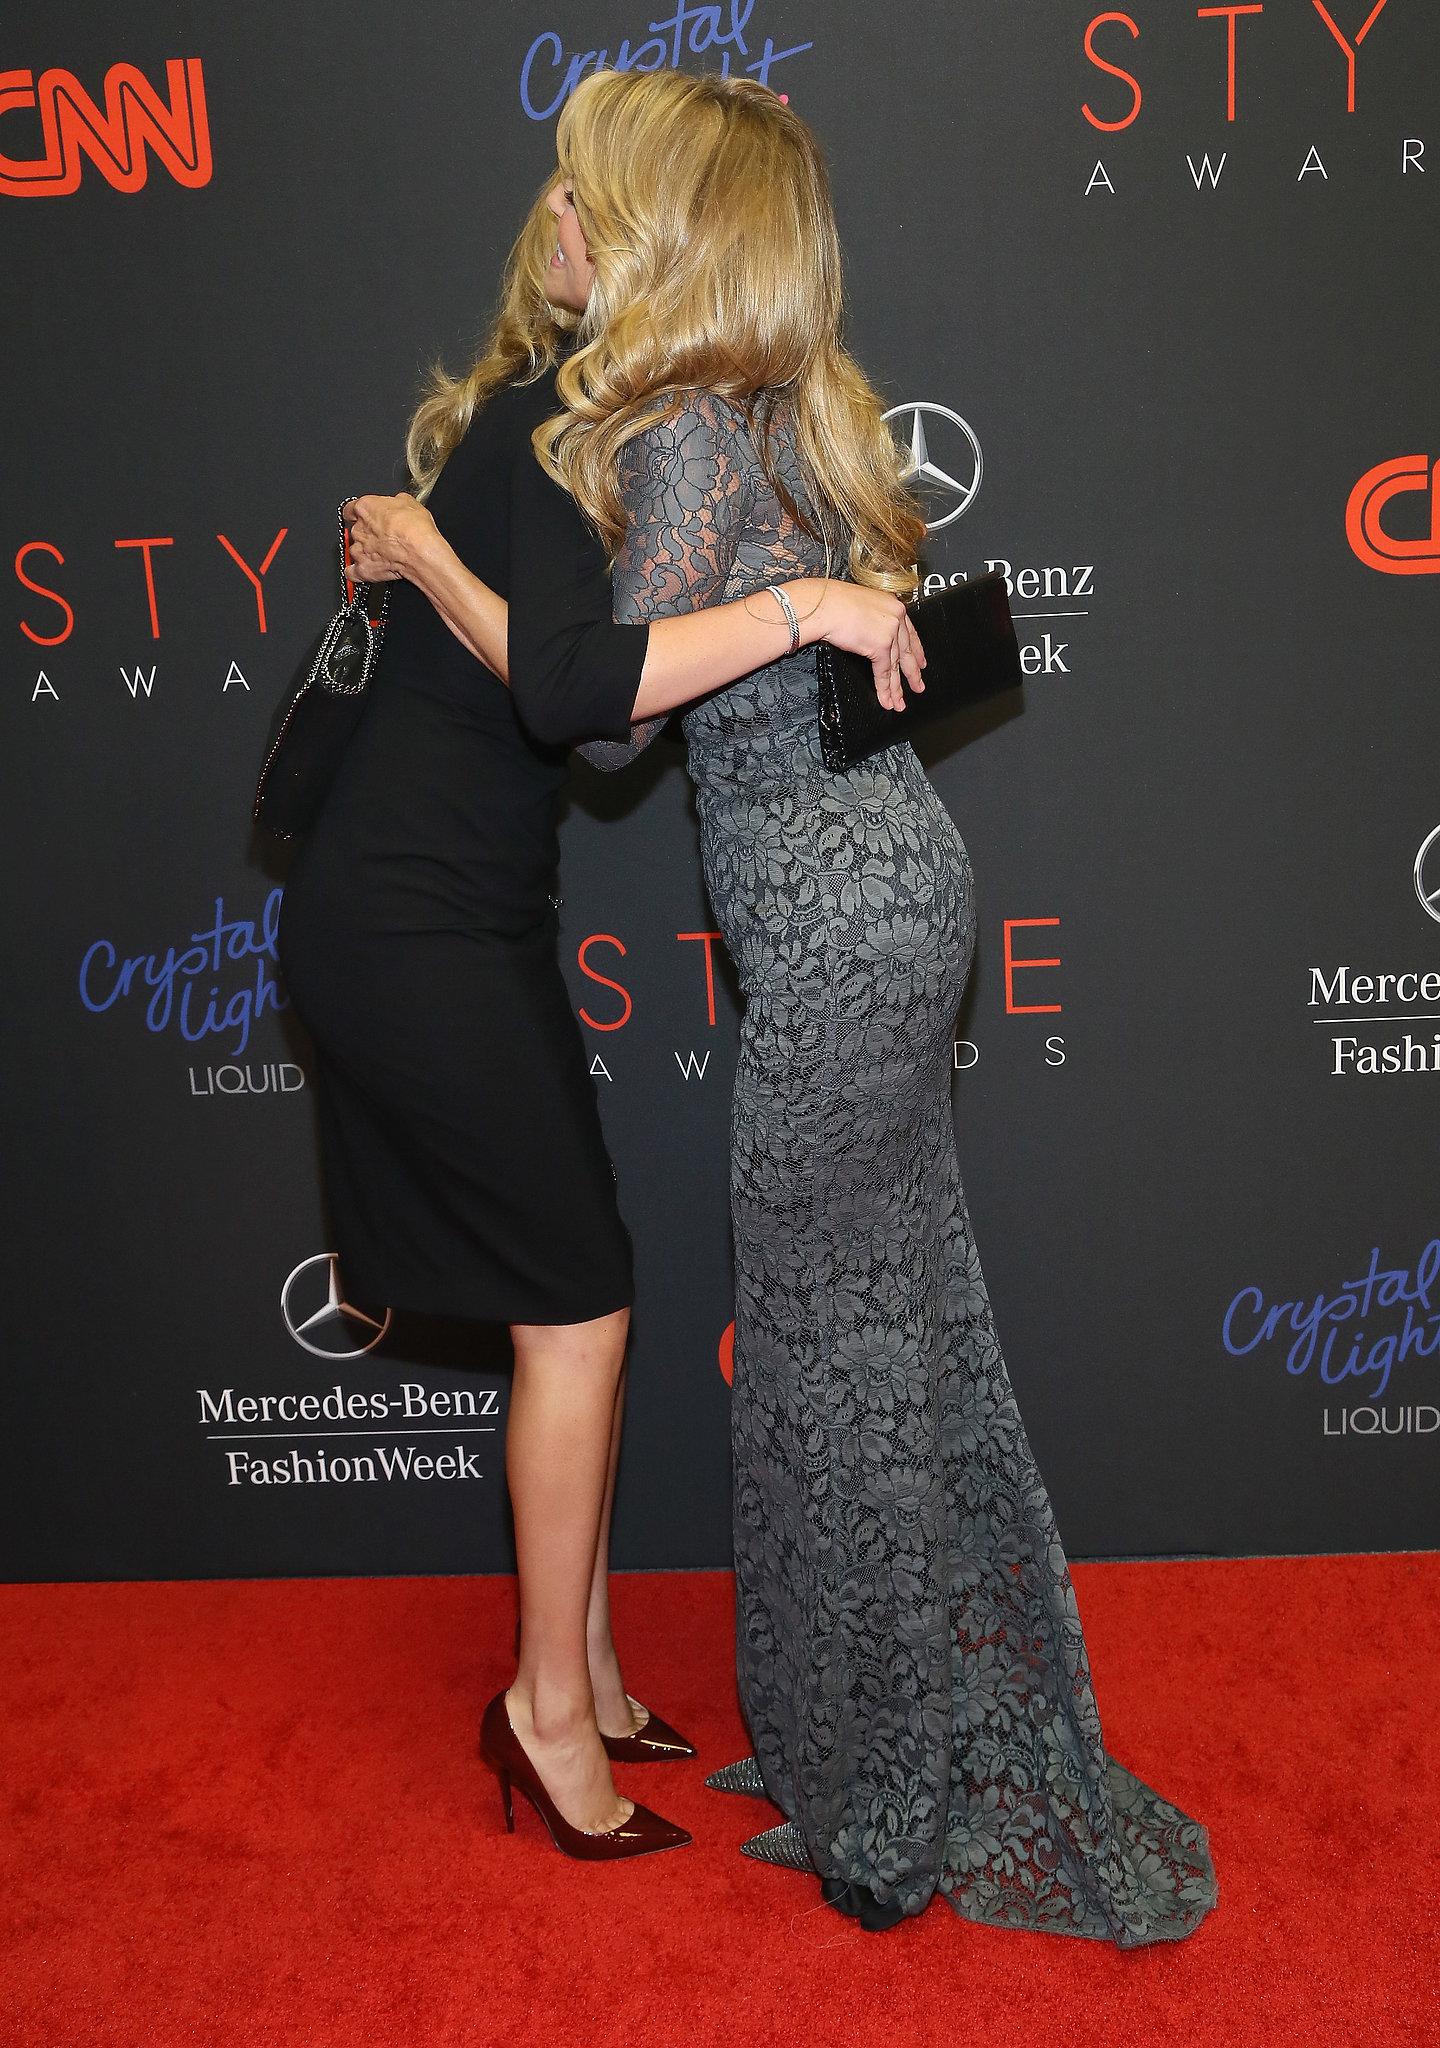 Kate Upton hugged Christie Brinkley on the red carpet.